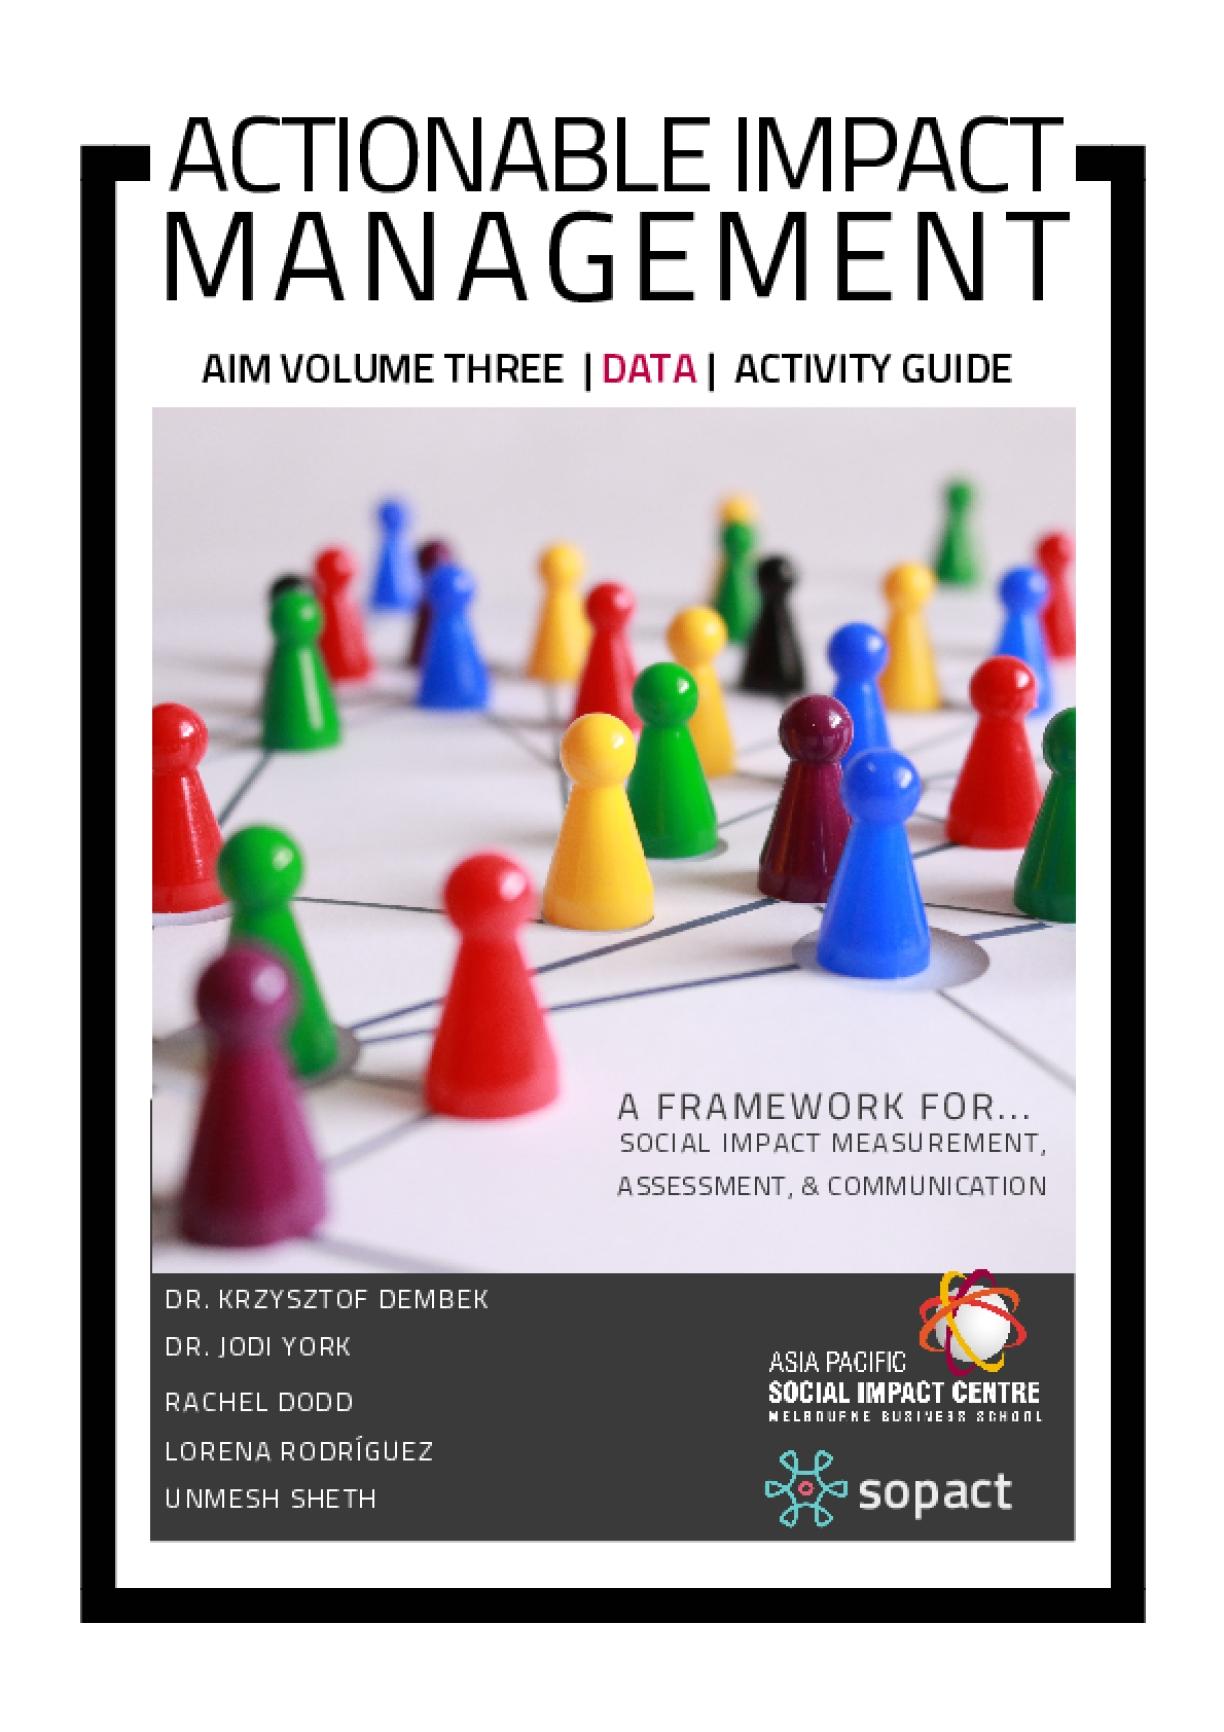 Actionable Impact Management (AIM) Volume Three: Data